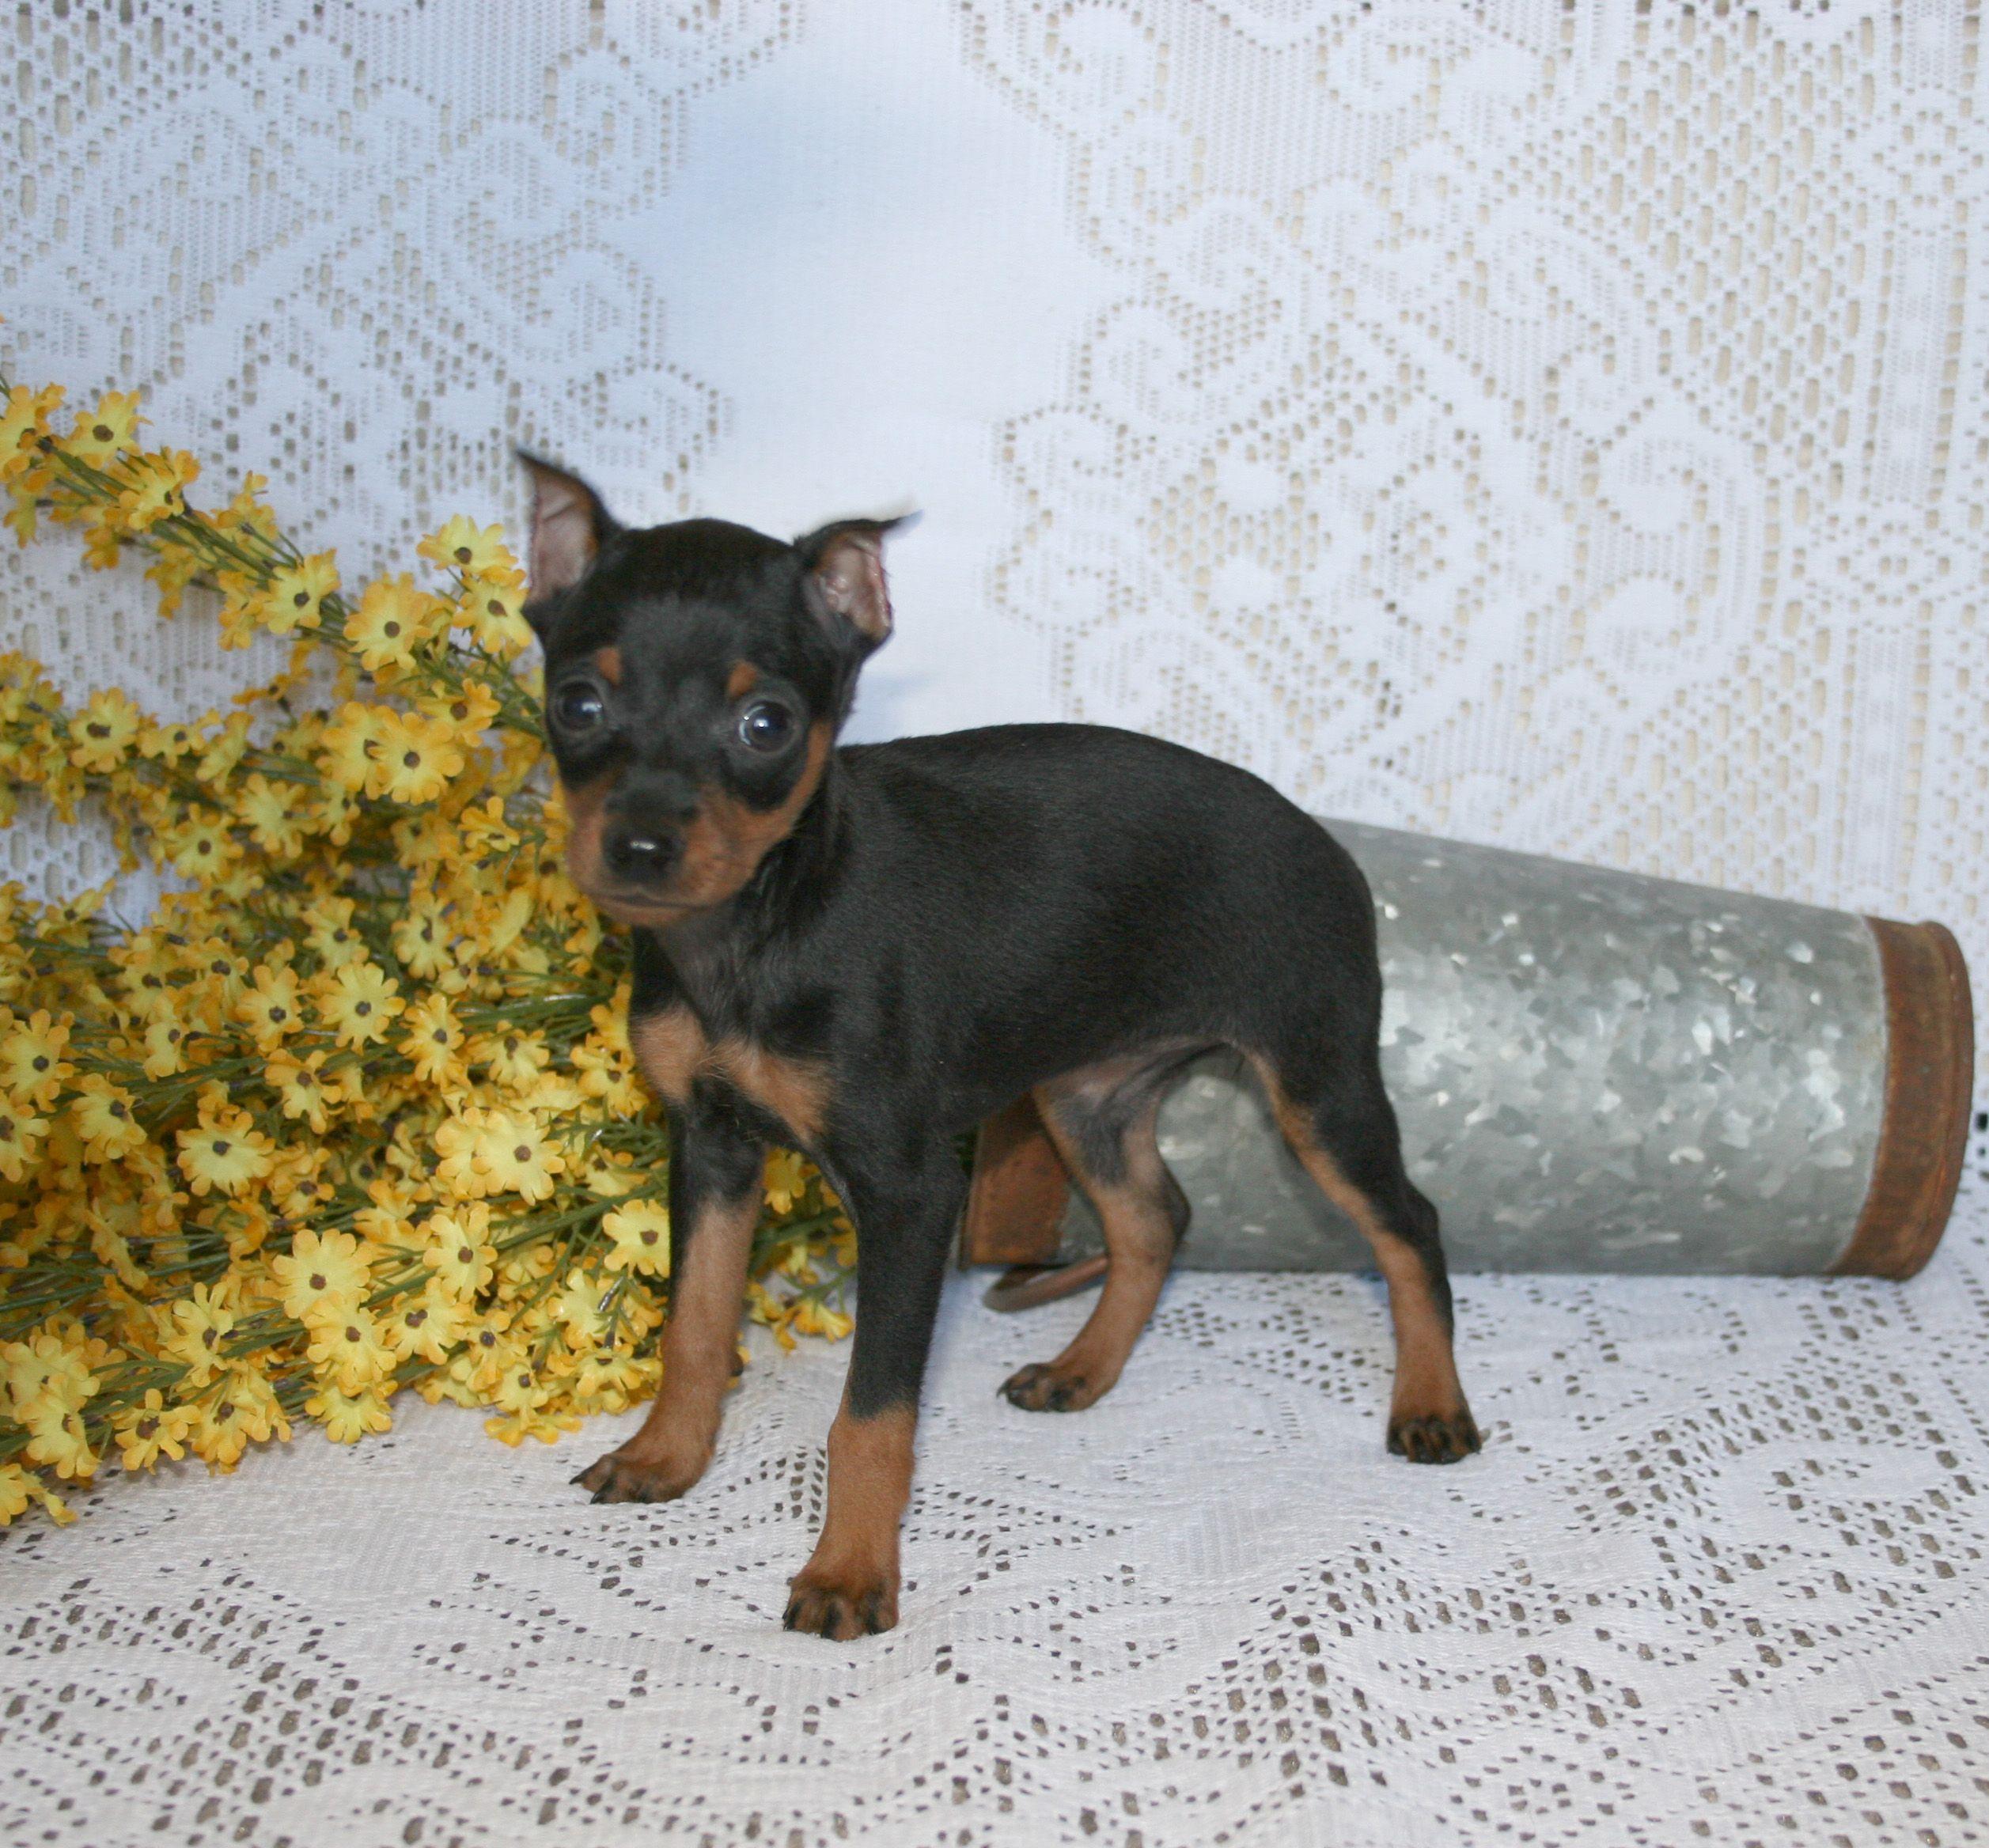 Pinterest Doberman Cute Poodle Toy Puppy For Sale 550 Fancy